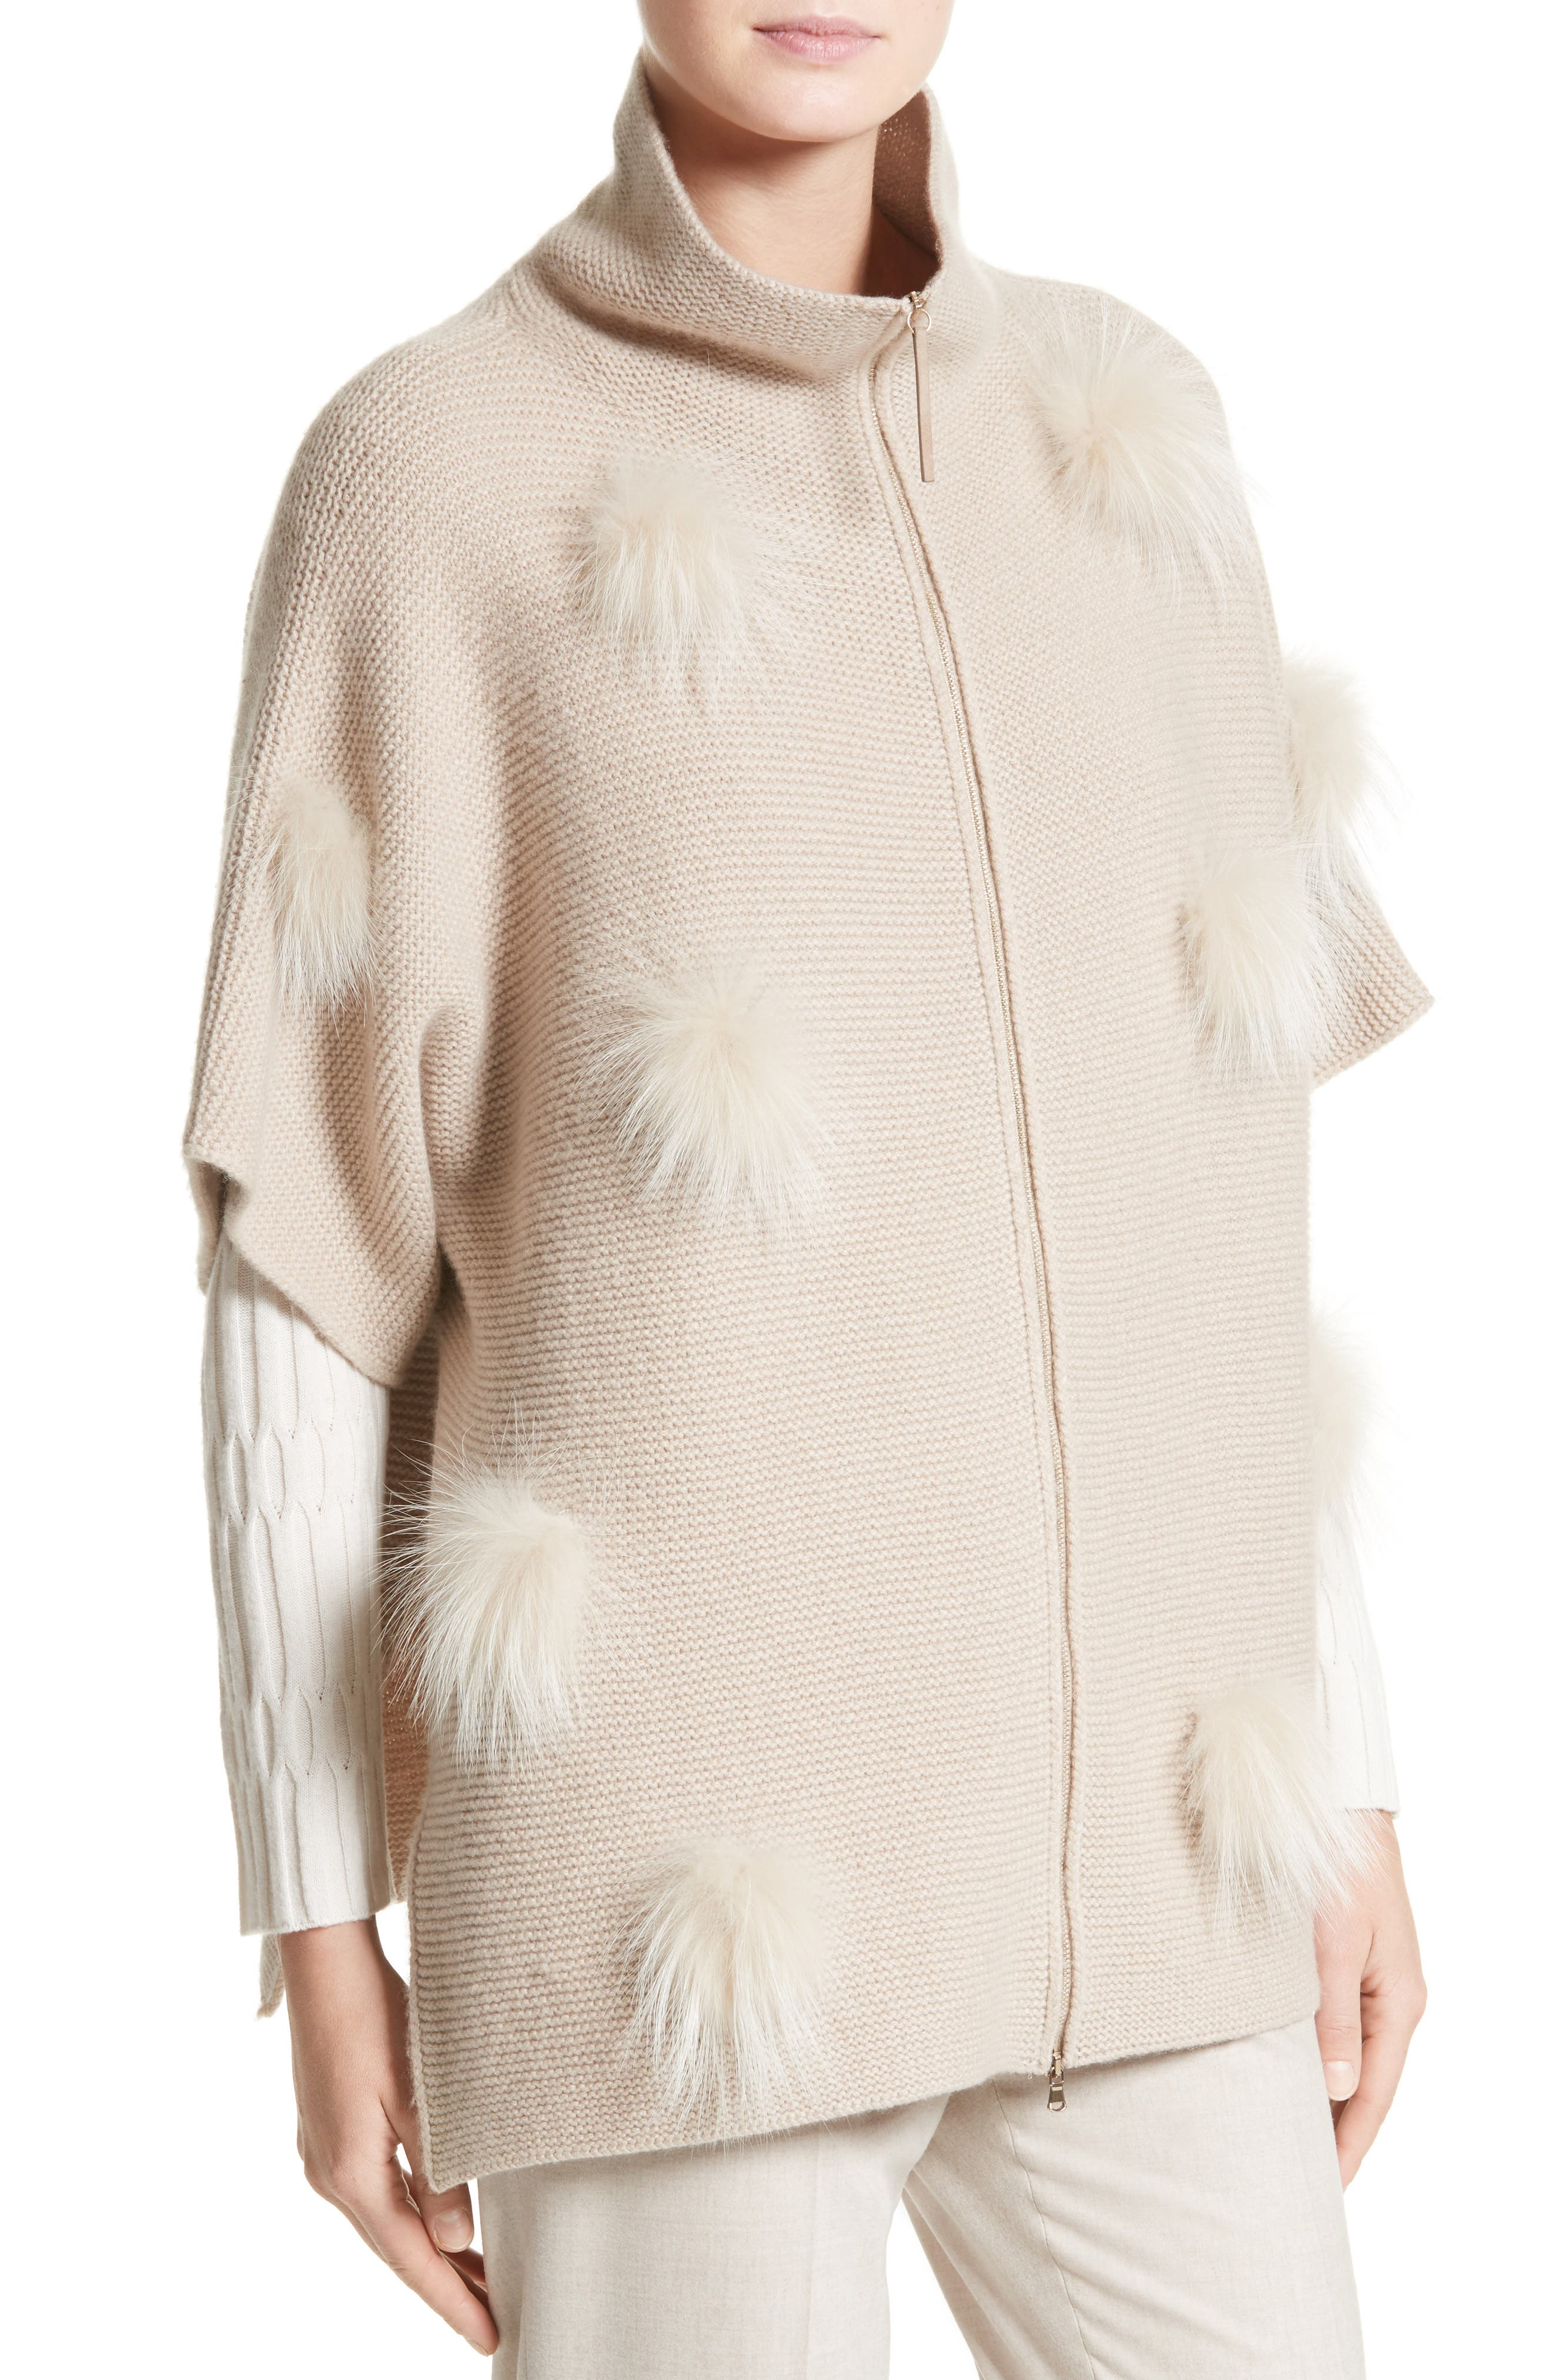 Micro Braid Cashmere Zip Cardigan with Genuine Fox Fur Trim,                             Alternate thumbnail 4, color,                             101